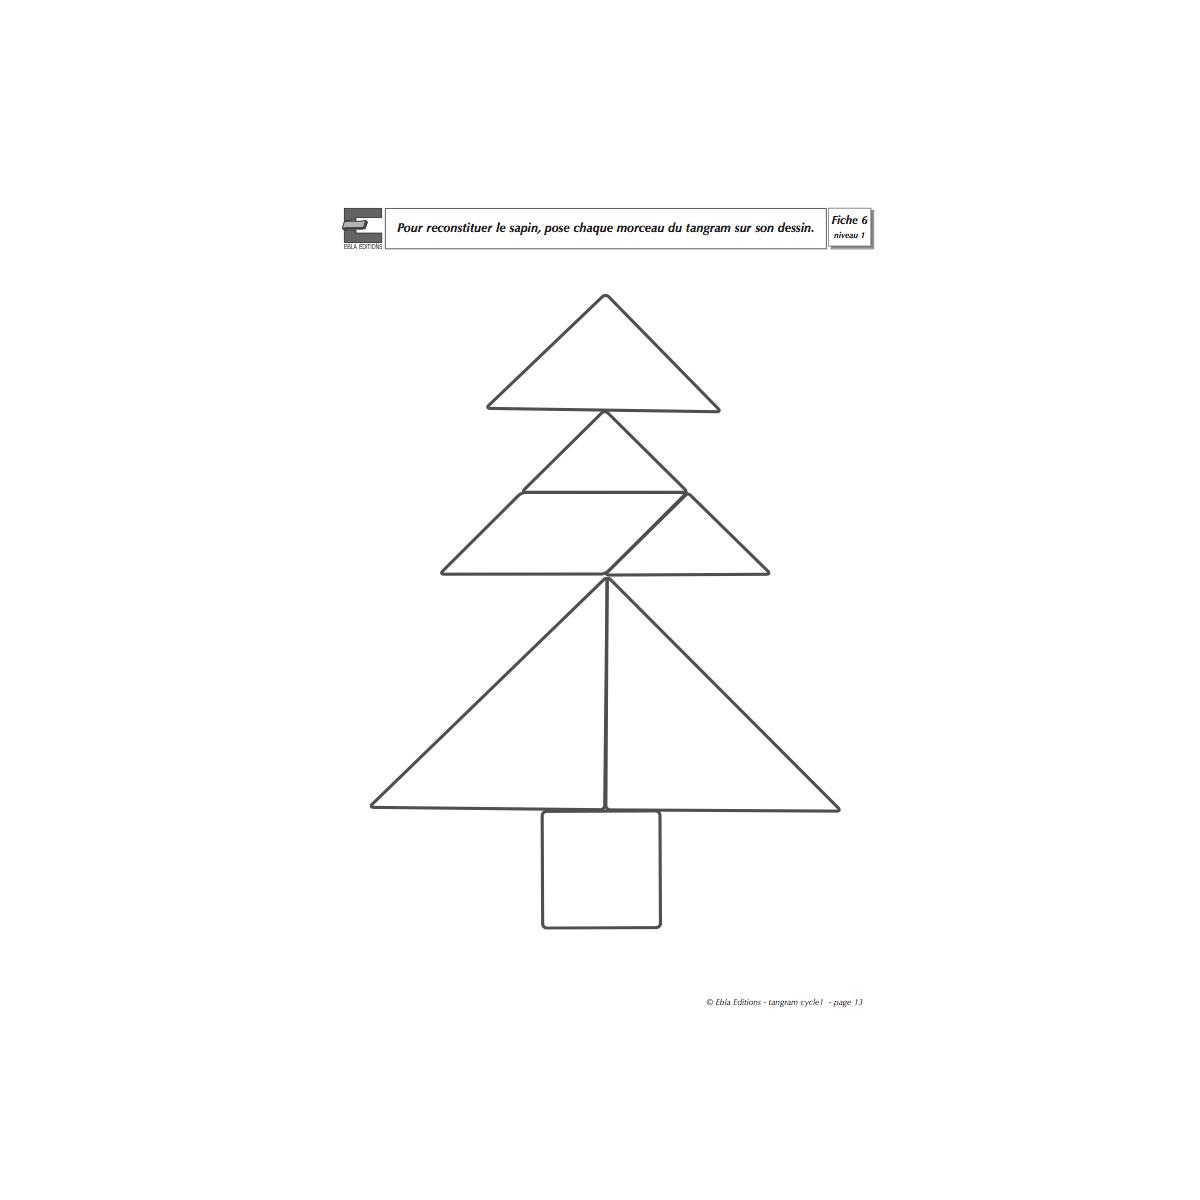 Fichier Tangram 3/5 Ans - Cycle 1 - Ebla Editions dedans Tangram A Imprimer